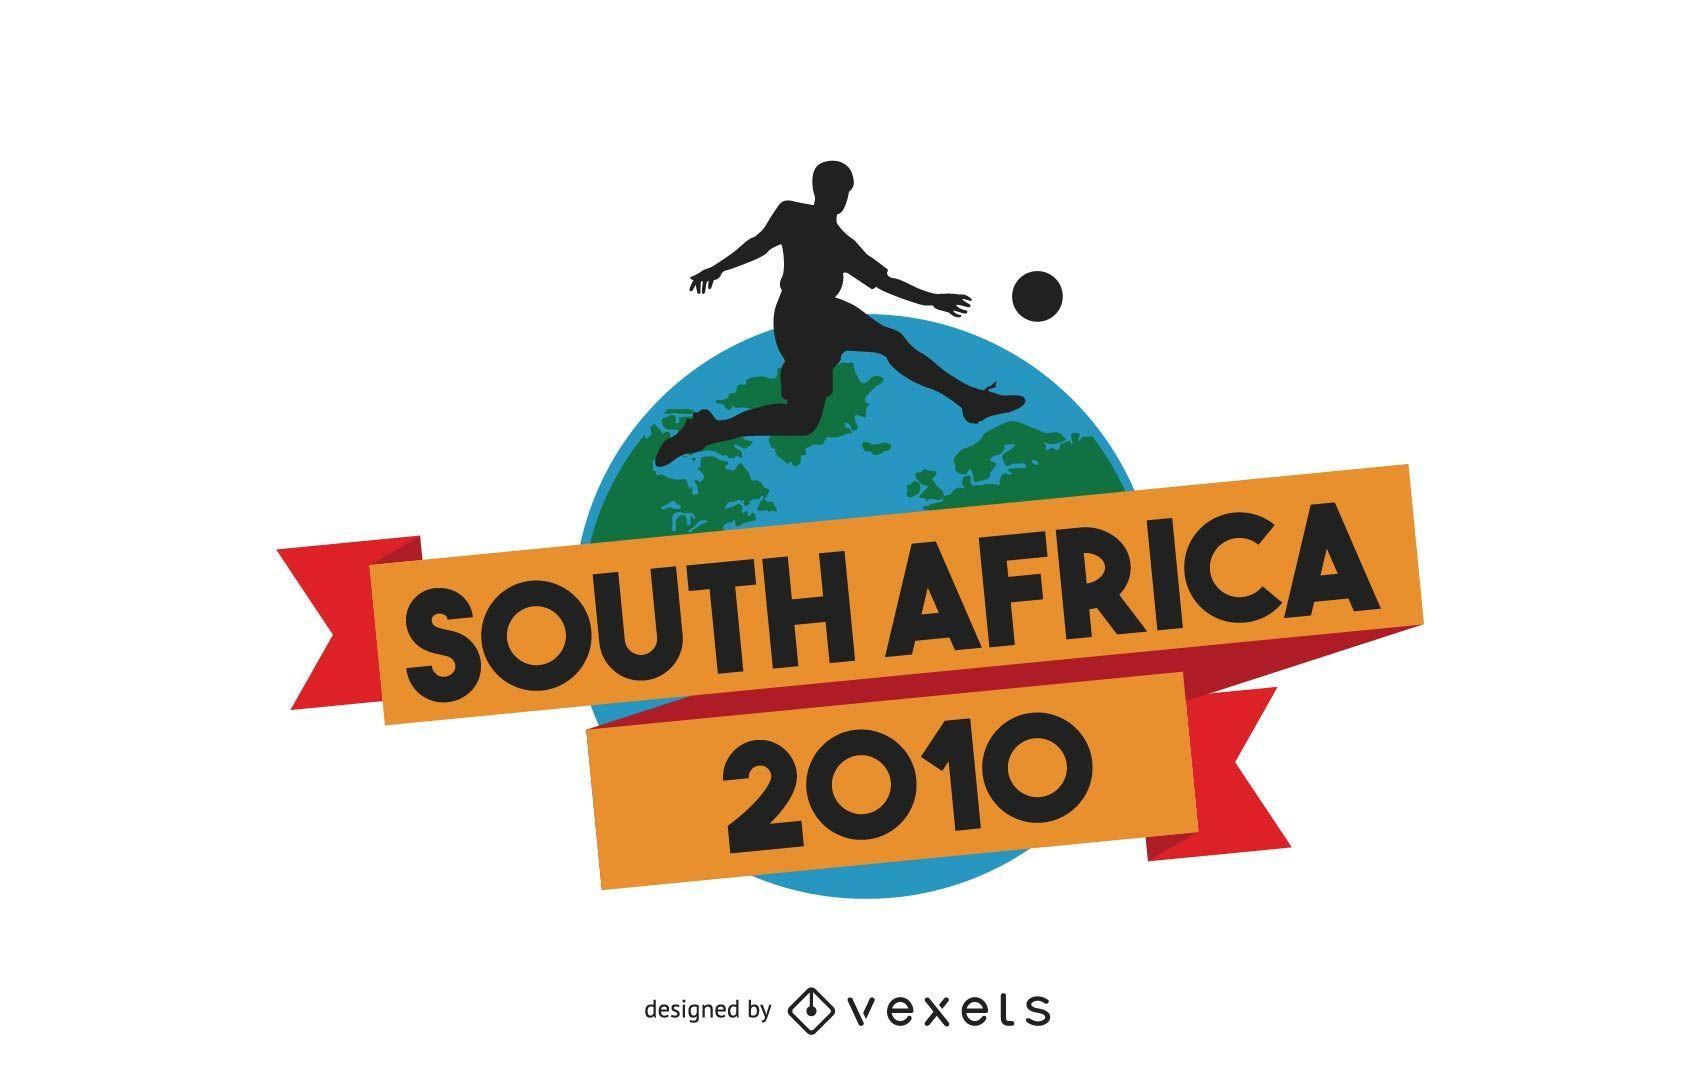 2010 sudáfrica copa del mundo fondos de pantalla vector